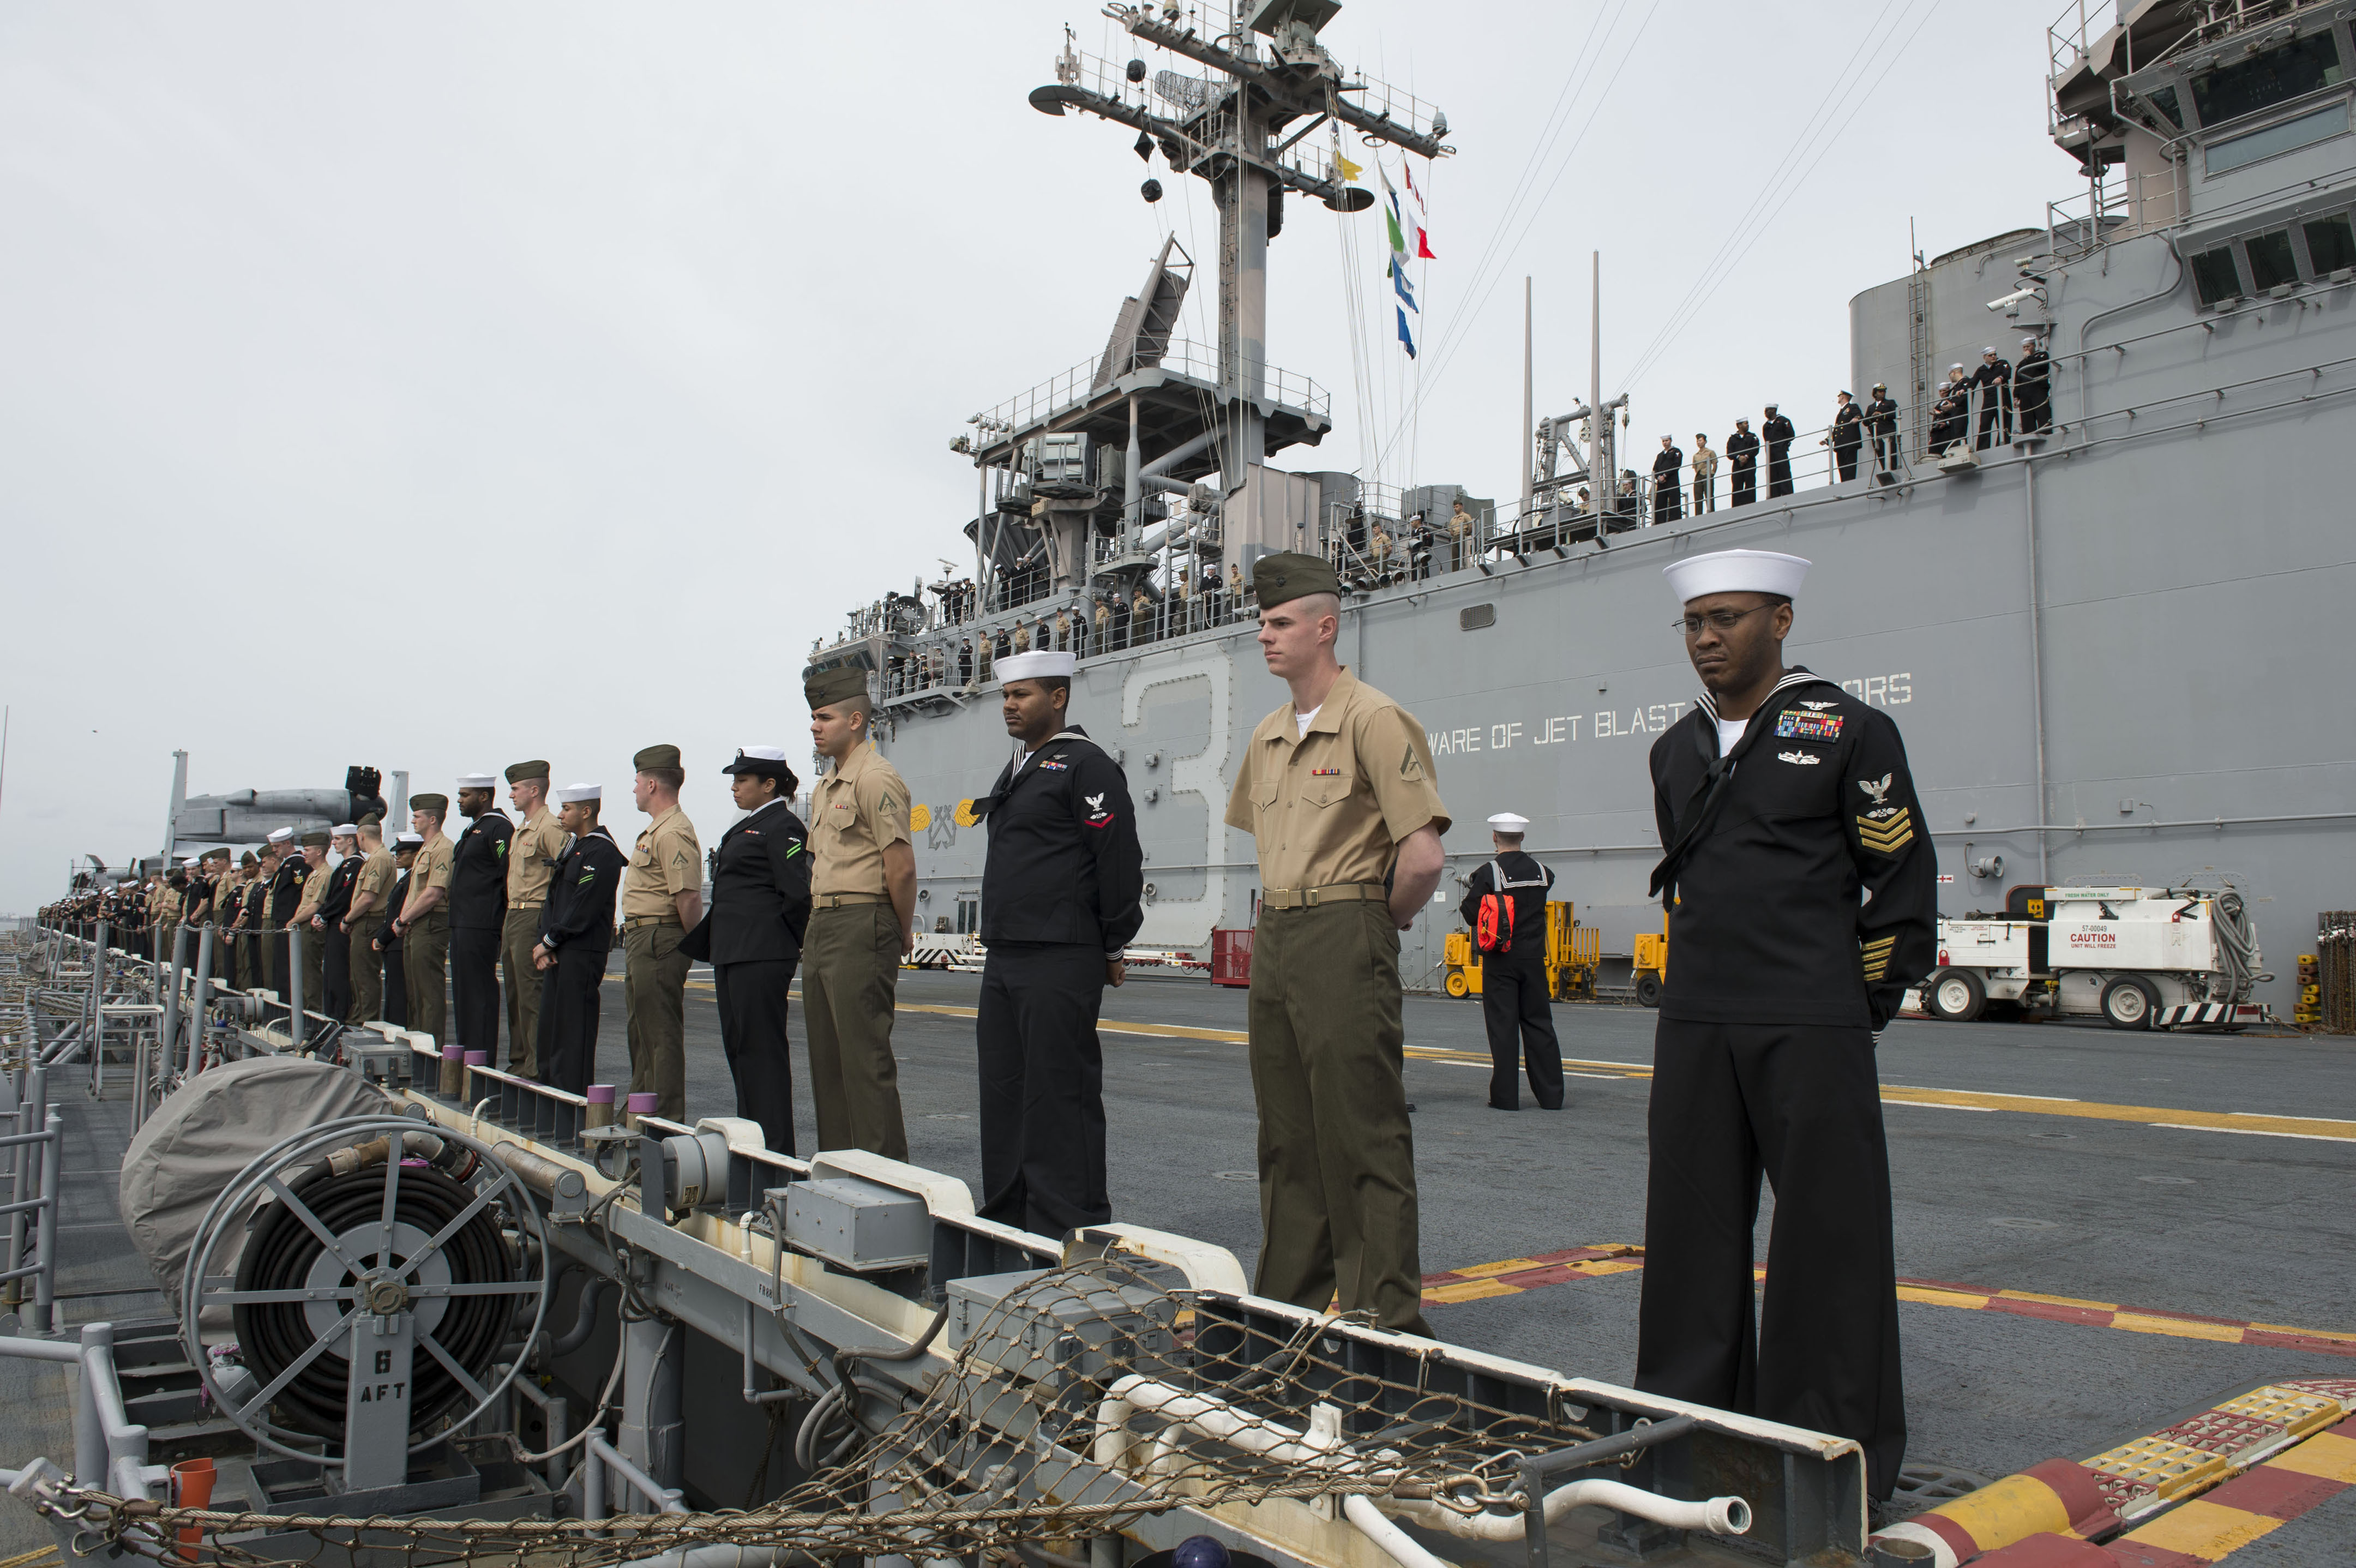 U.S._Sailors_and_Marines_man_the_rails_of_the_amphibious_assault_ship_USS_Kearsarge_%28LHD_3%29_as_the_ship_departs_Norfolk%2C_Va.%2C_March_11%2C_2013_130311-N-XY604-016.jpg